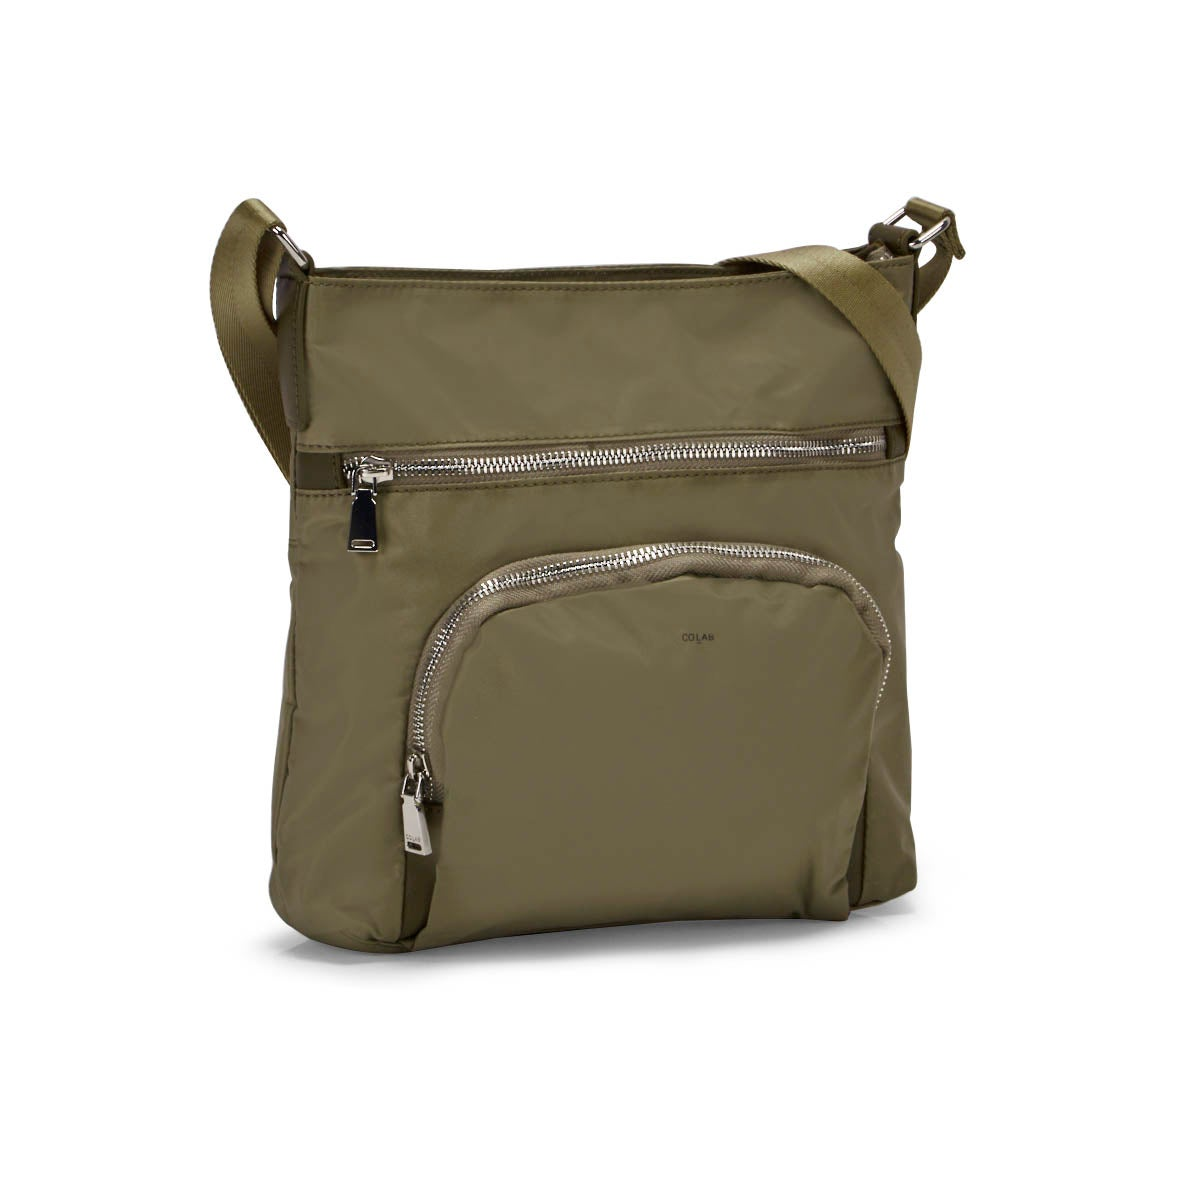 Lds khaki medium top zip crossbody bag